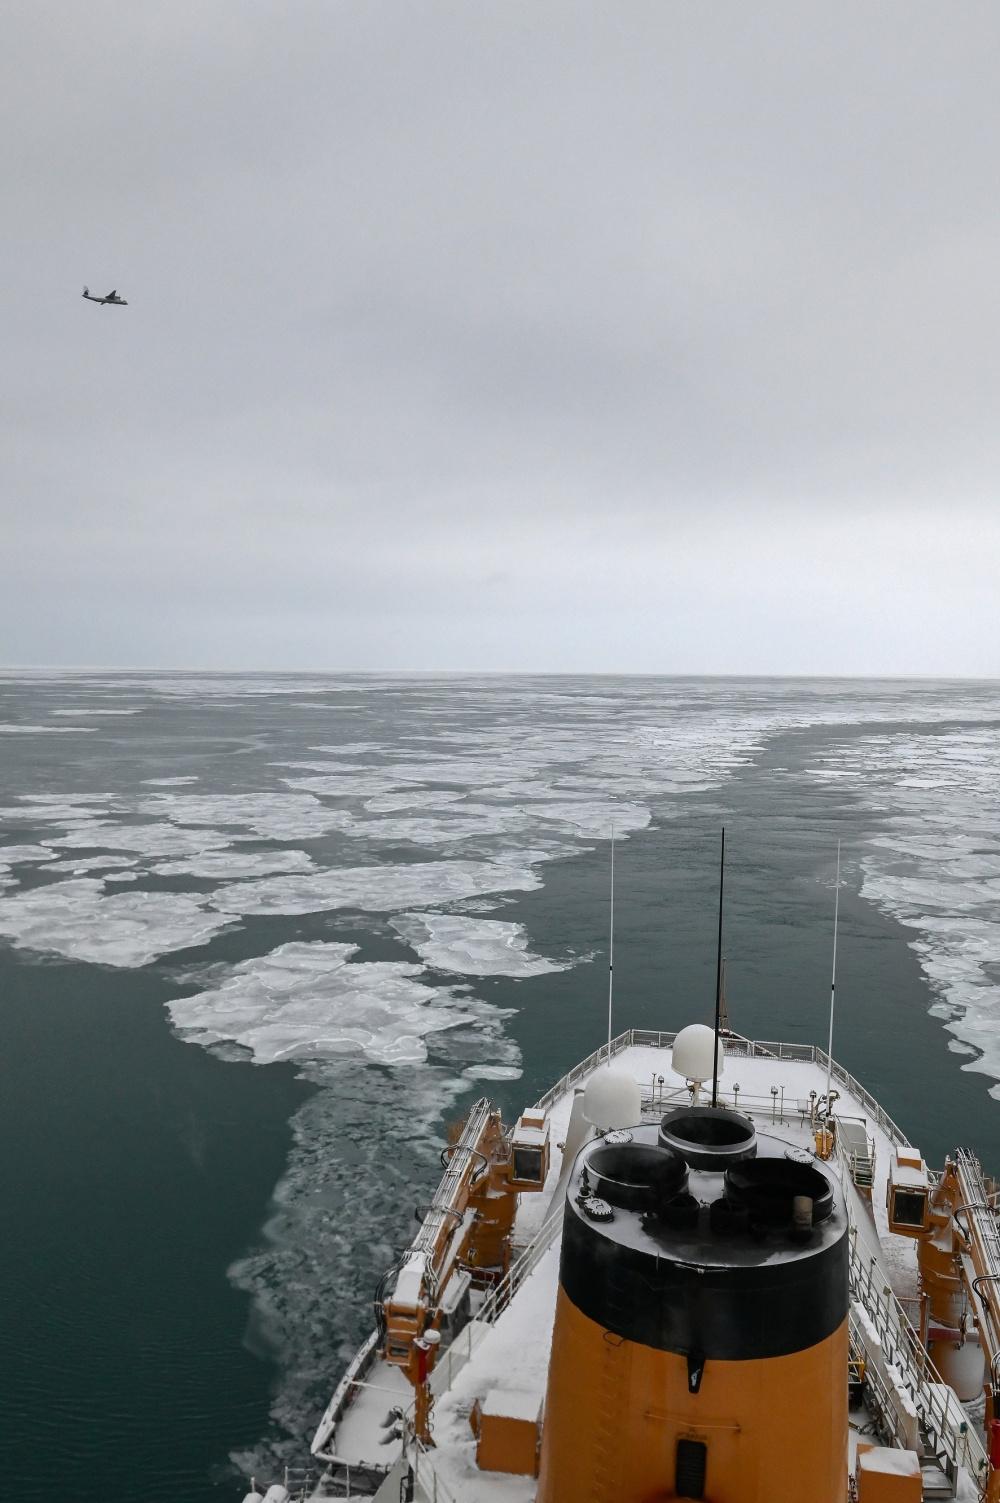 U.S. Coast Guard, Russian Border Guard Continue Patrols Along Maritime Boundary Line